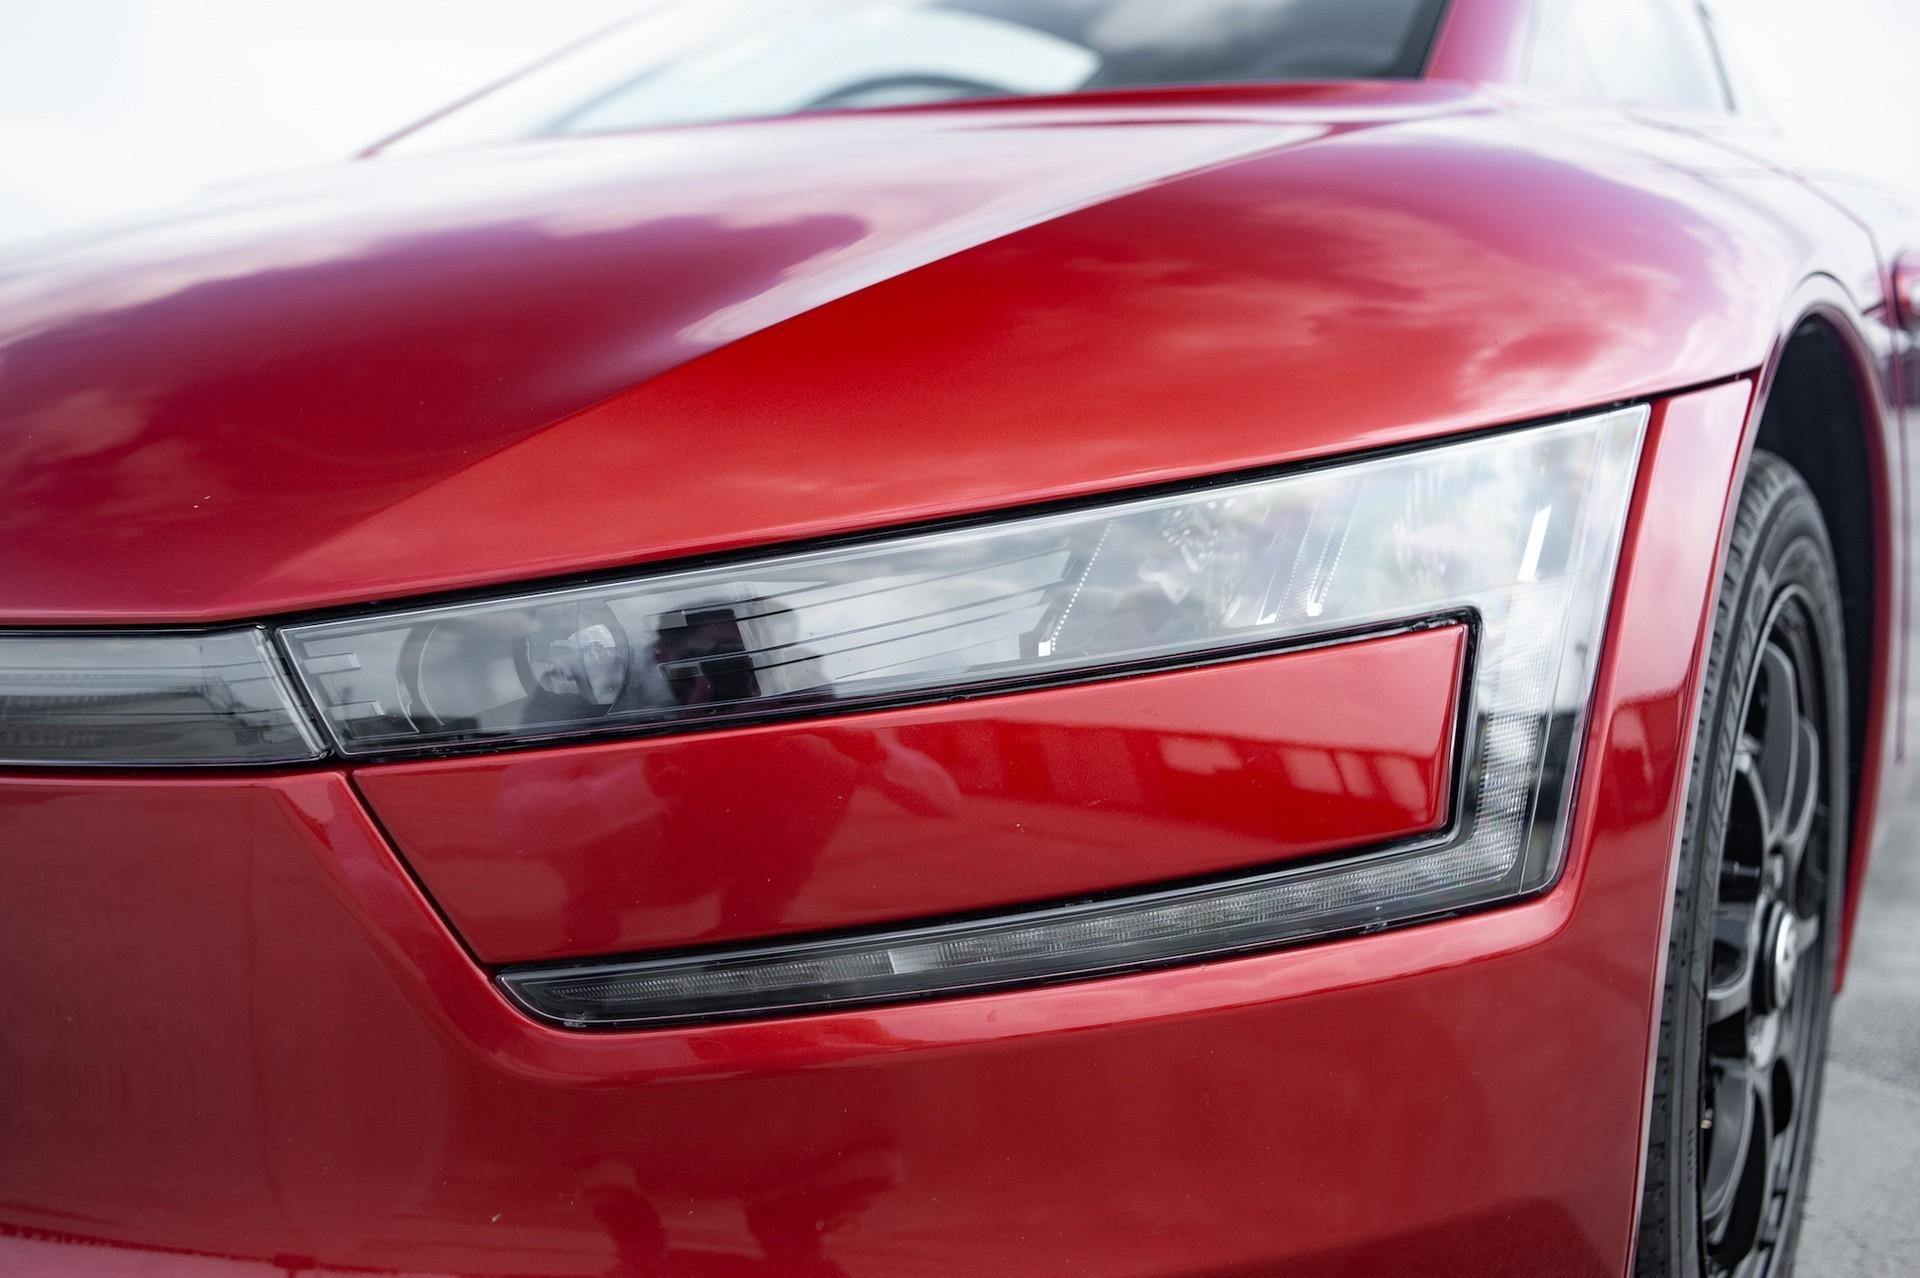 Volkswagen_XL1_sale-0063